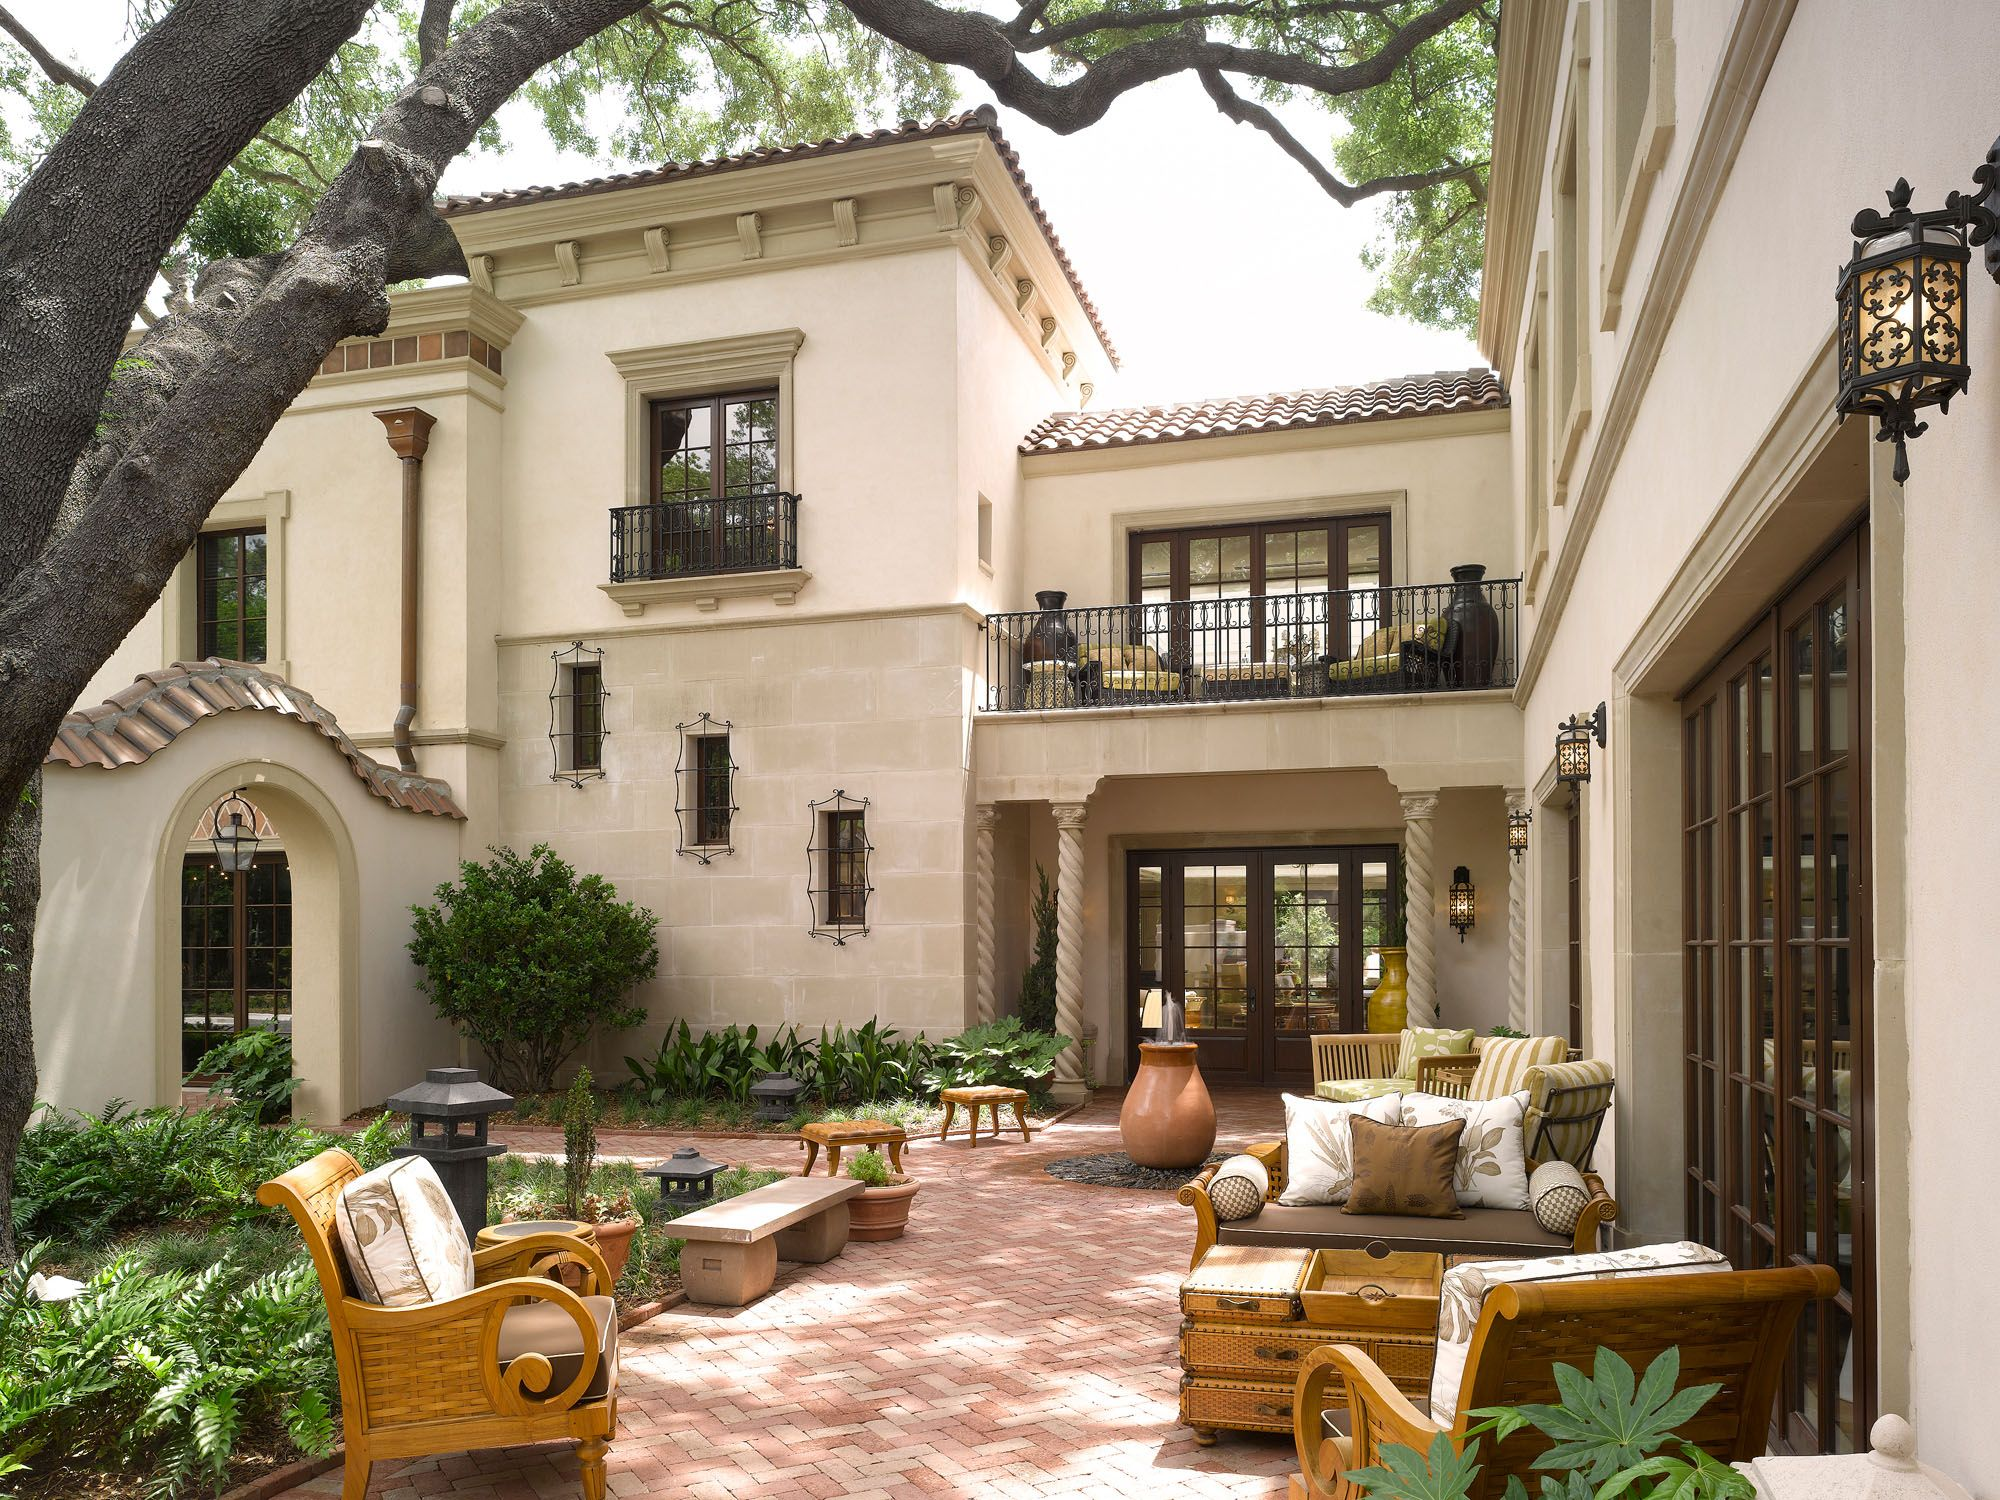 commercial properties harrison design undefined discover more at. Black Bedroom Furniture Sets. Home Design Ideas